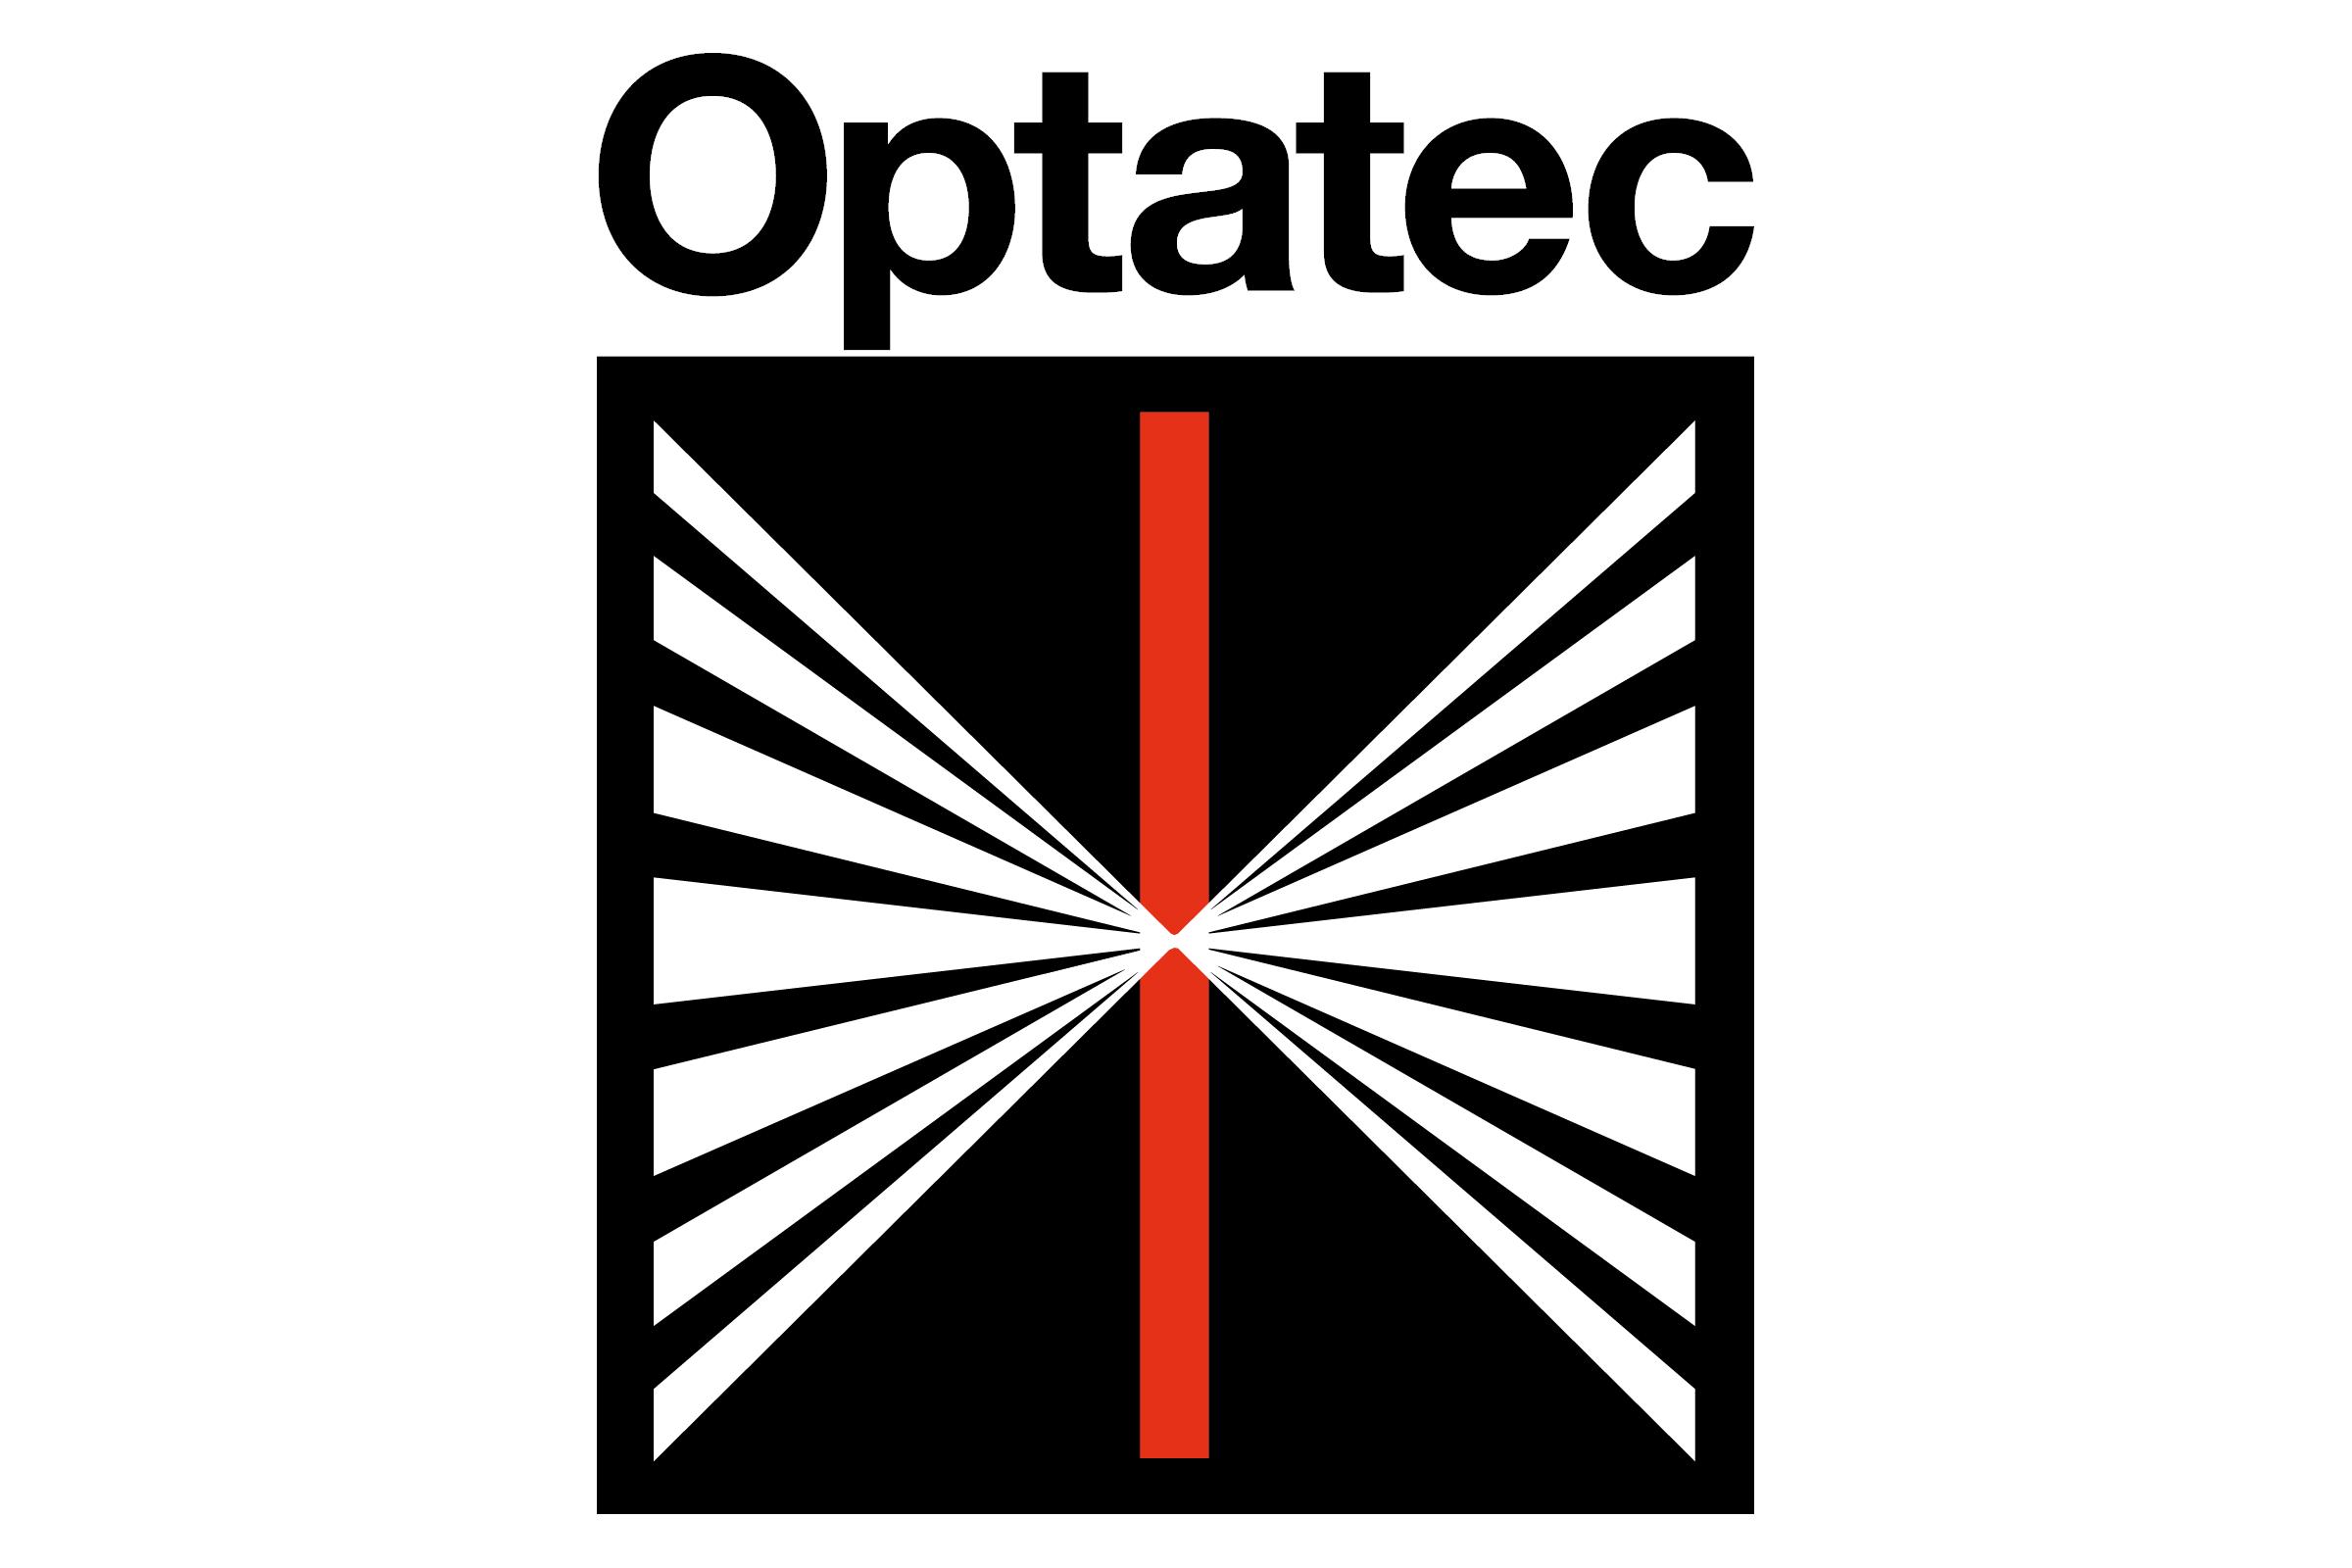 Logo Optatec 2020